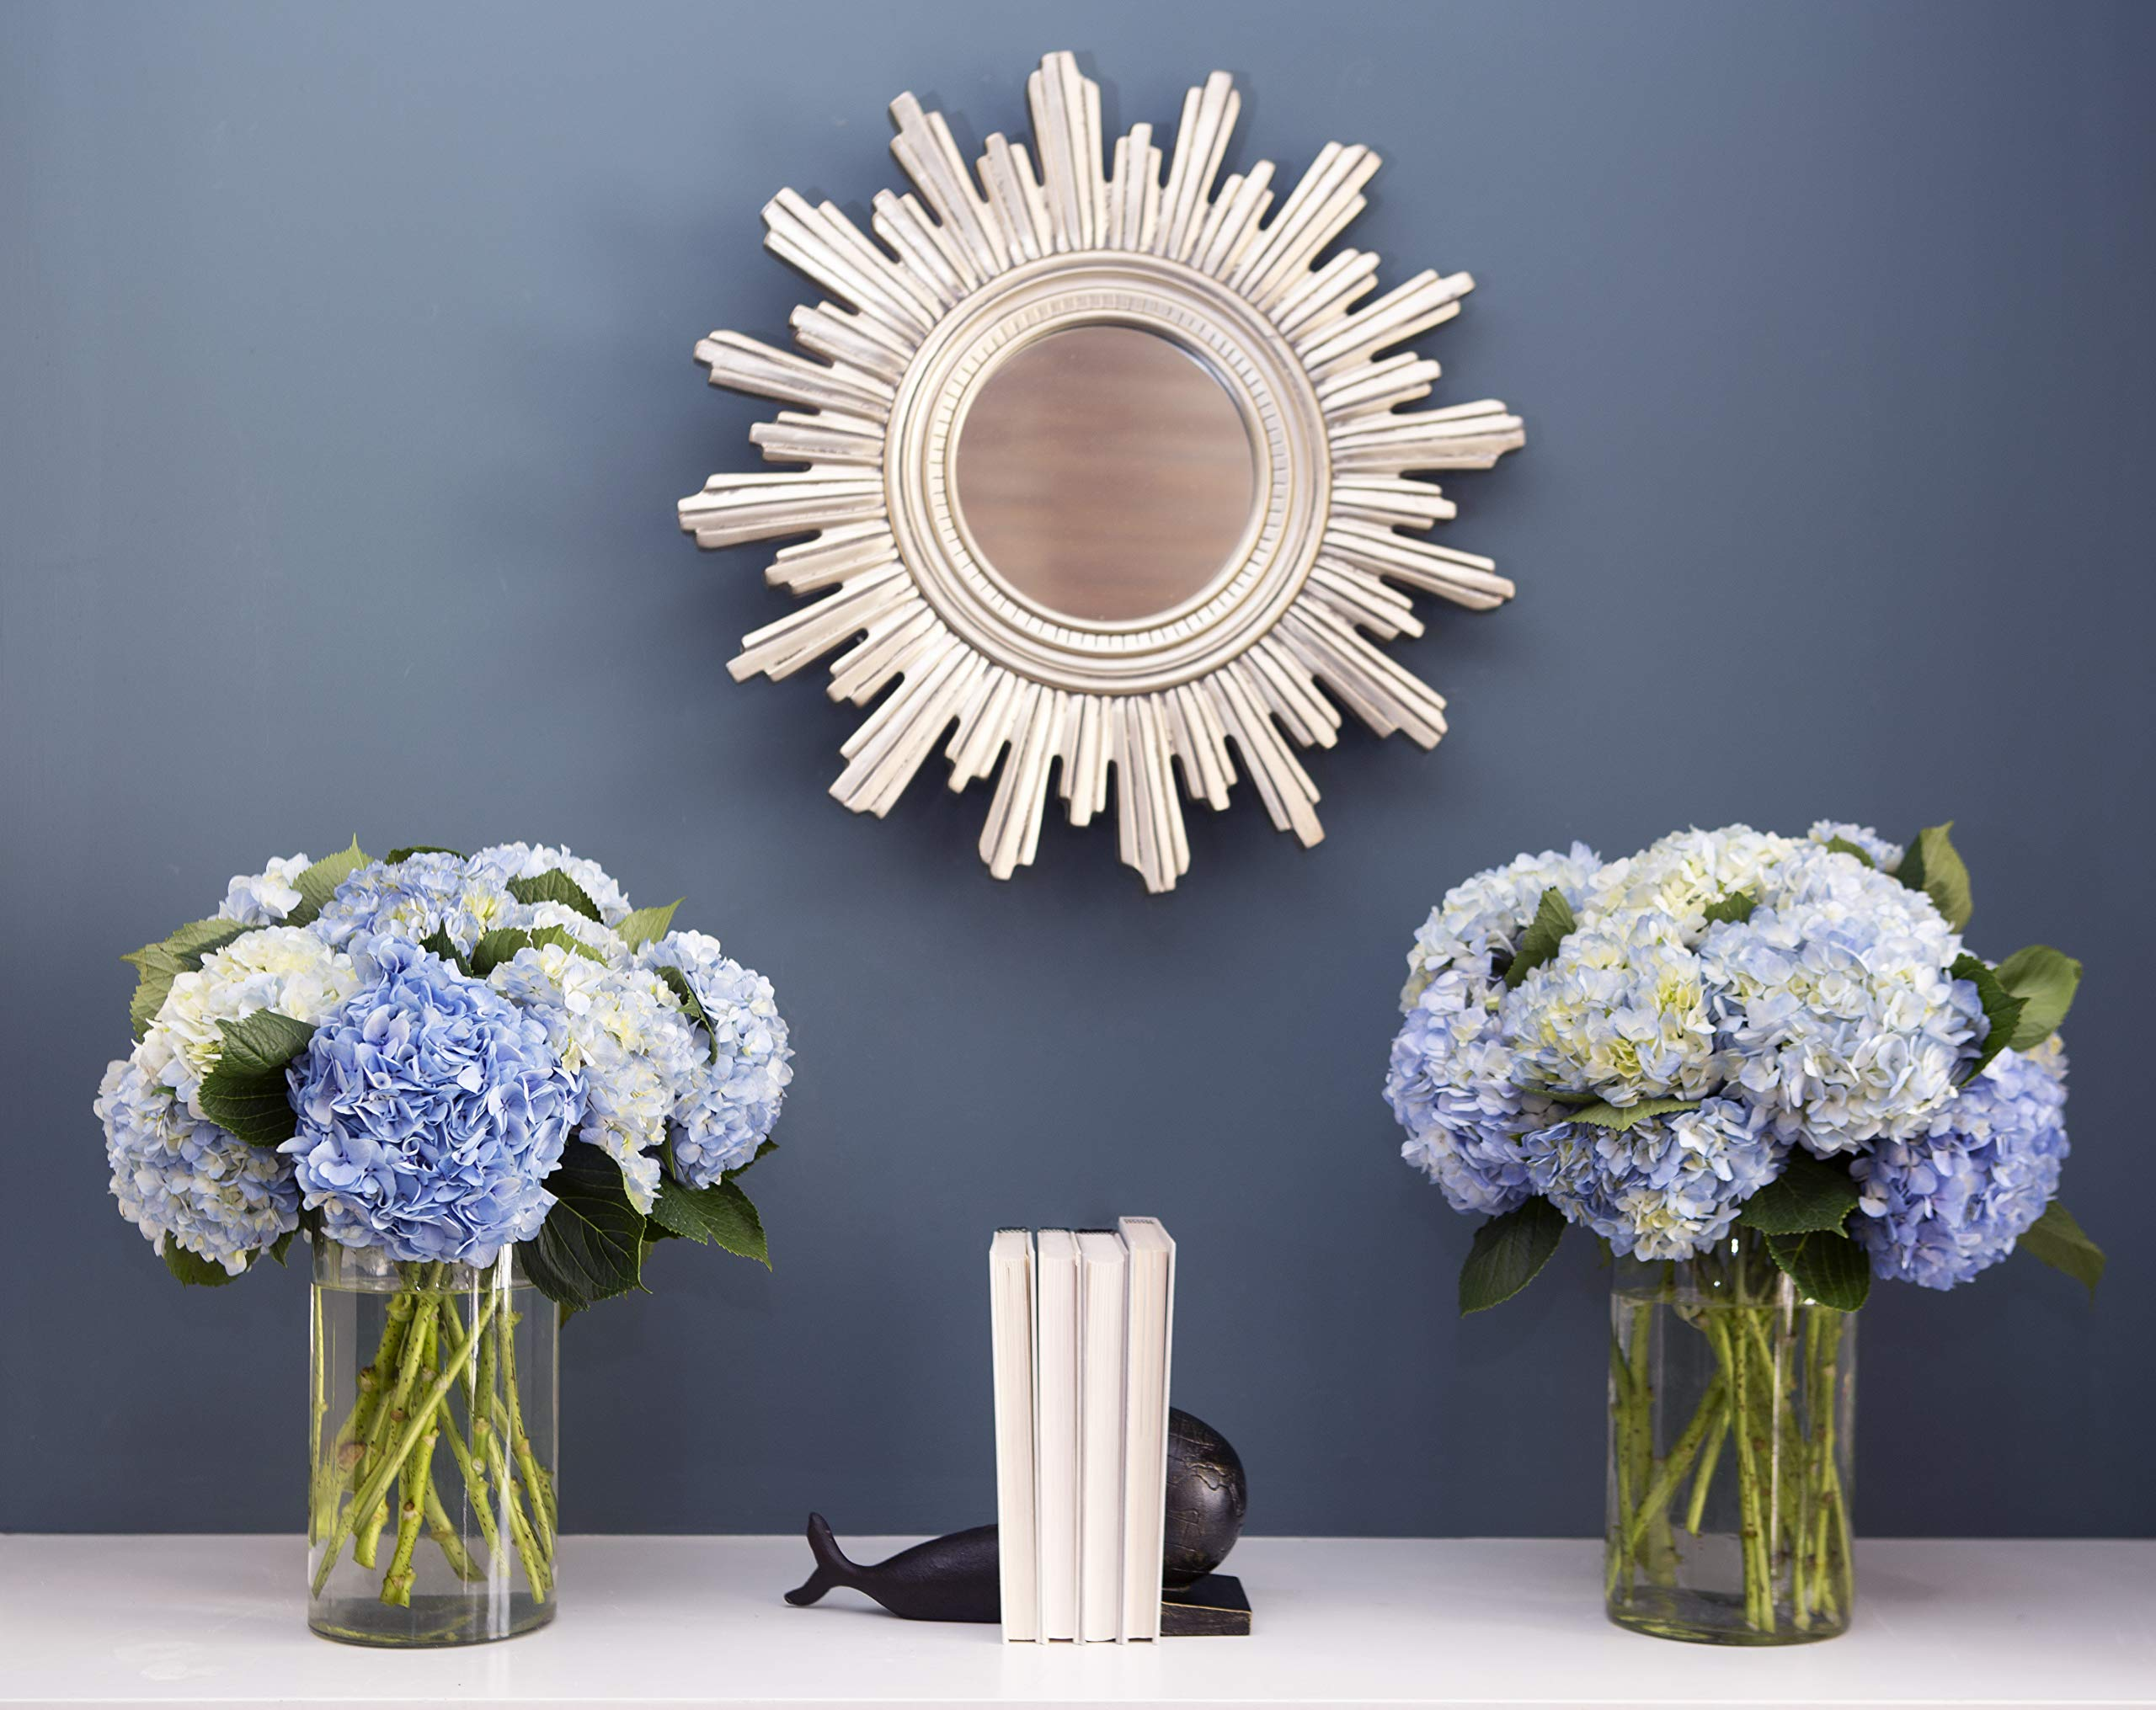 Blooms2Door 30 Blue Hydrangeas (Farm-Fresh, Naturally Colored, Premium Quality) by Blooms2Door (Image #4)